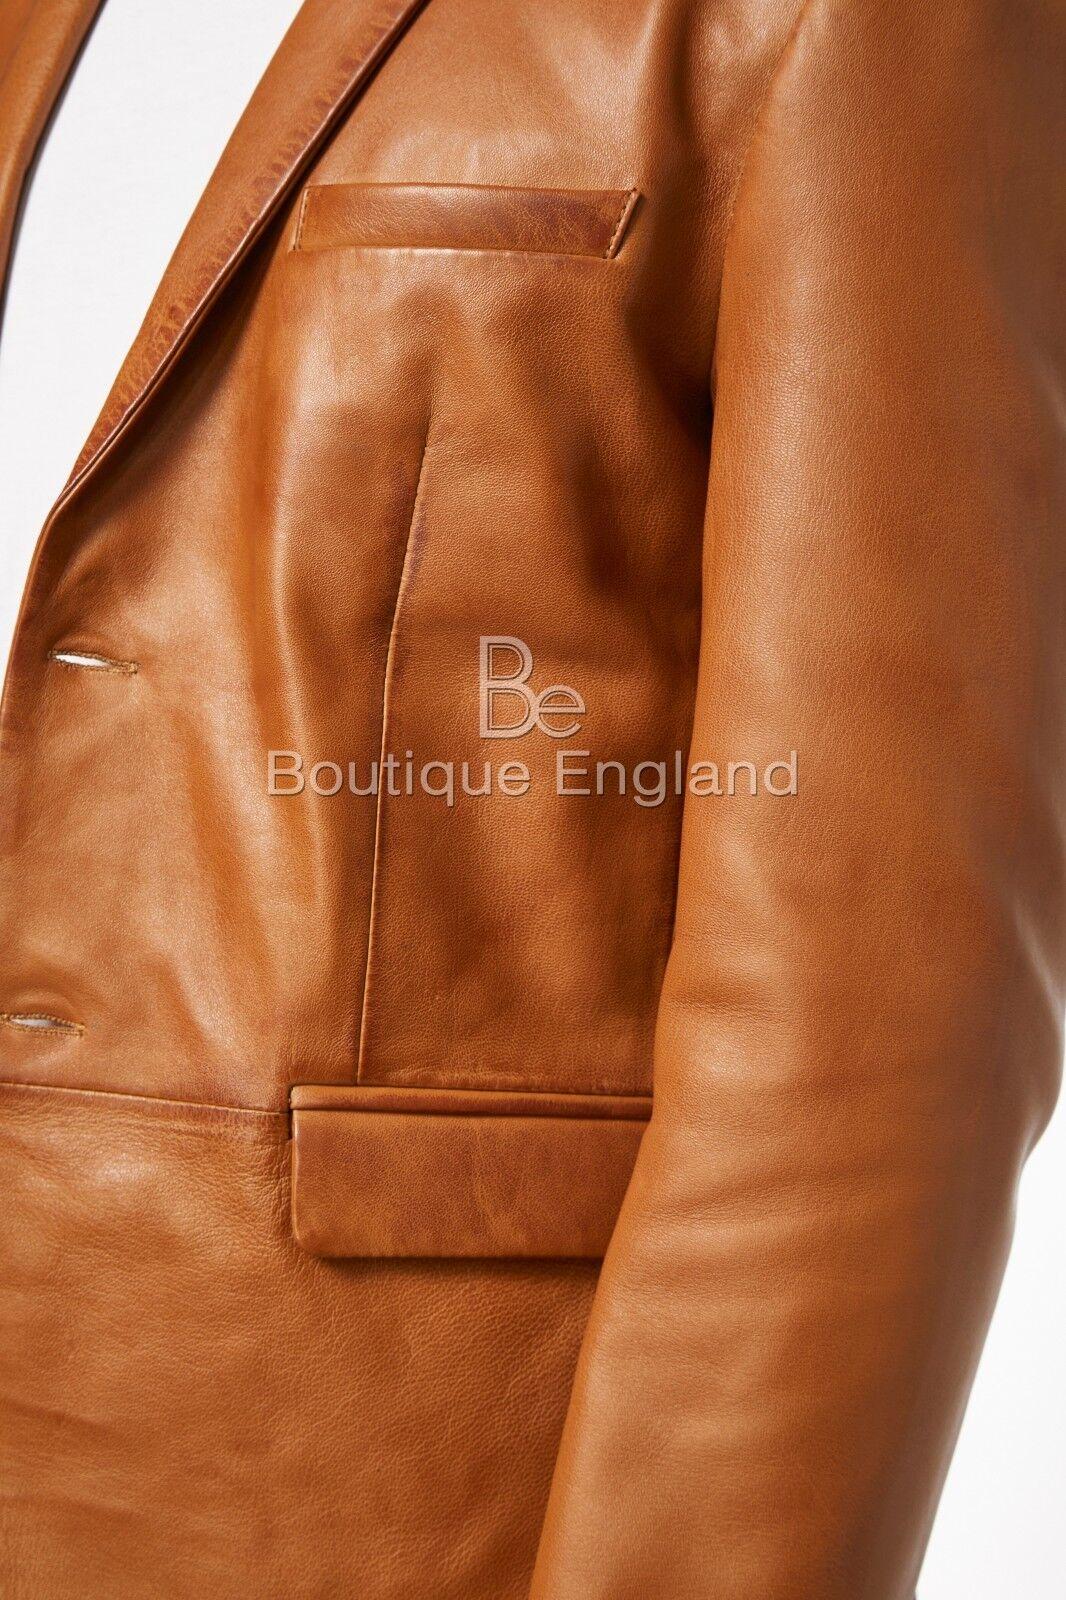 Mens Leather BLAZER TAN Classic Classic Classic ITALIAN TailGoldt Soft 100% REAL LEATHER 3450 | Nutzen Sie Materialien voll aus  6acb1b